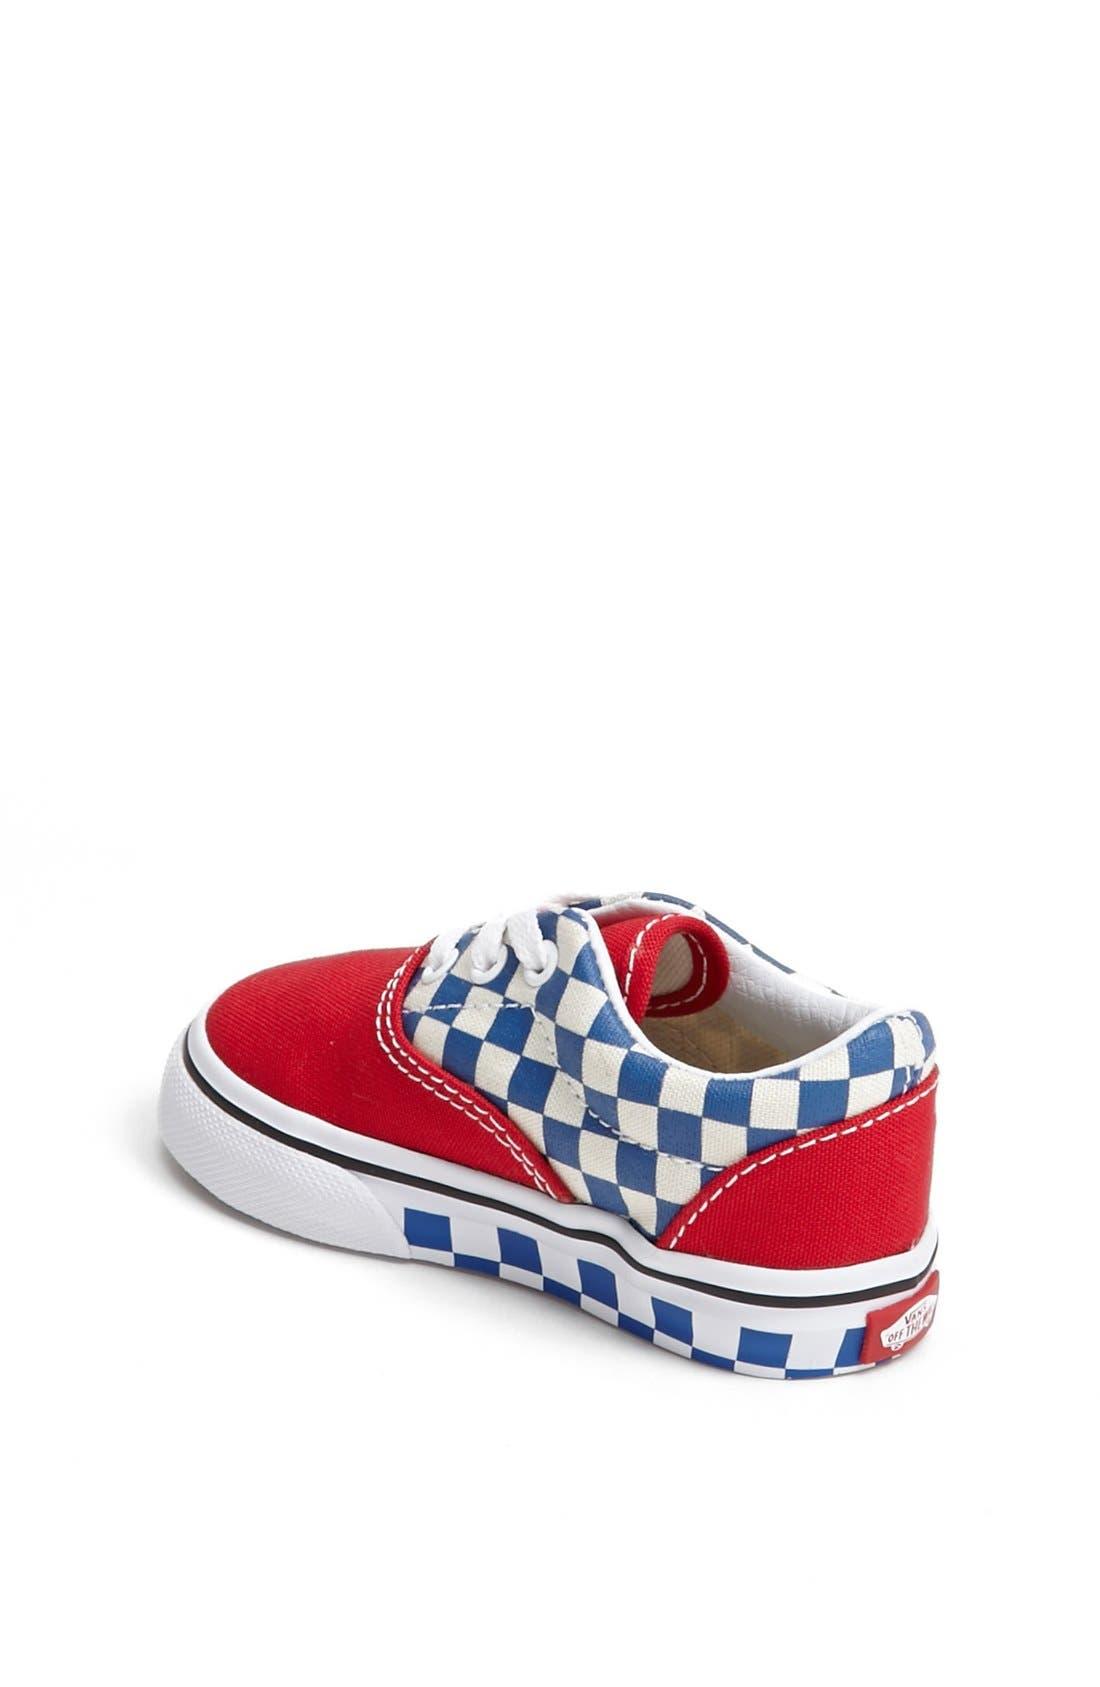 Alternate Image 2  - Vans 'Era - Checkerboard' Sneaker (Baby, Walker & Toddler)